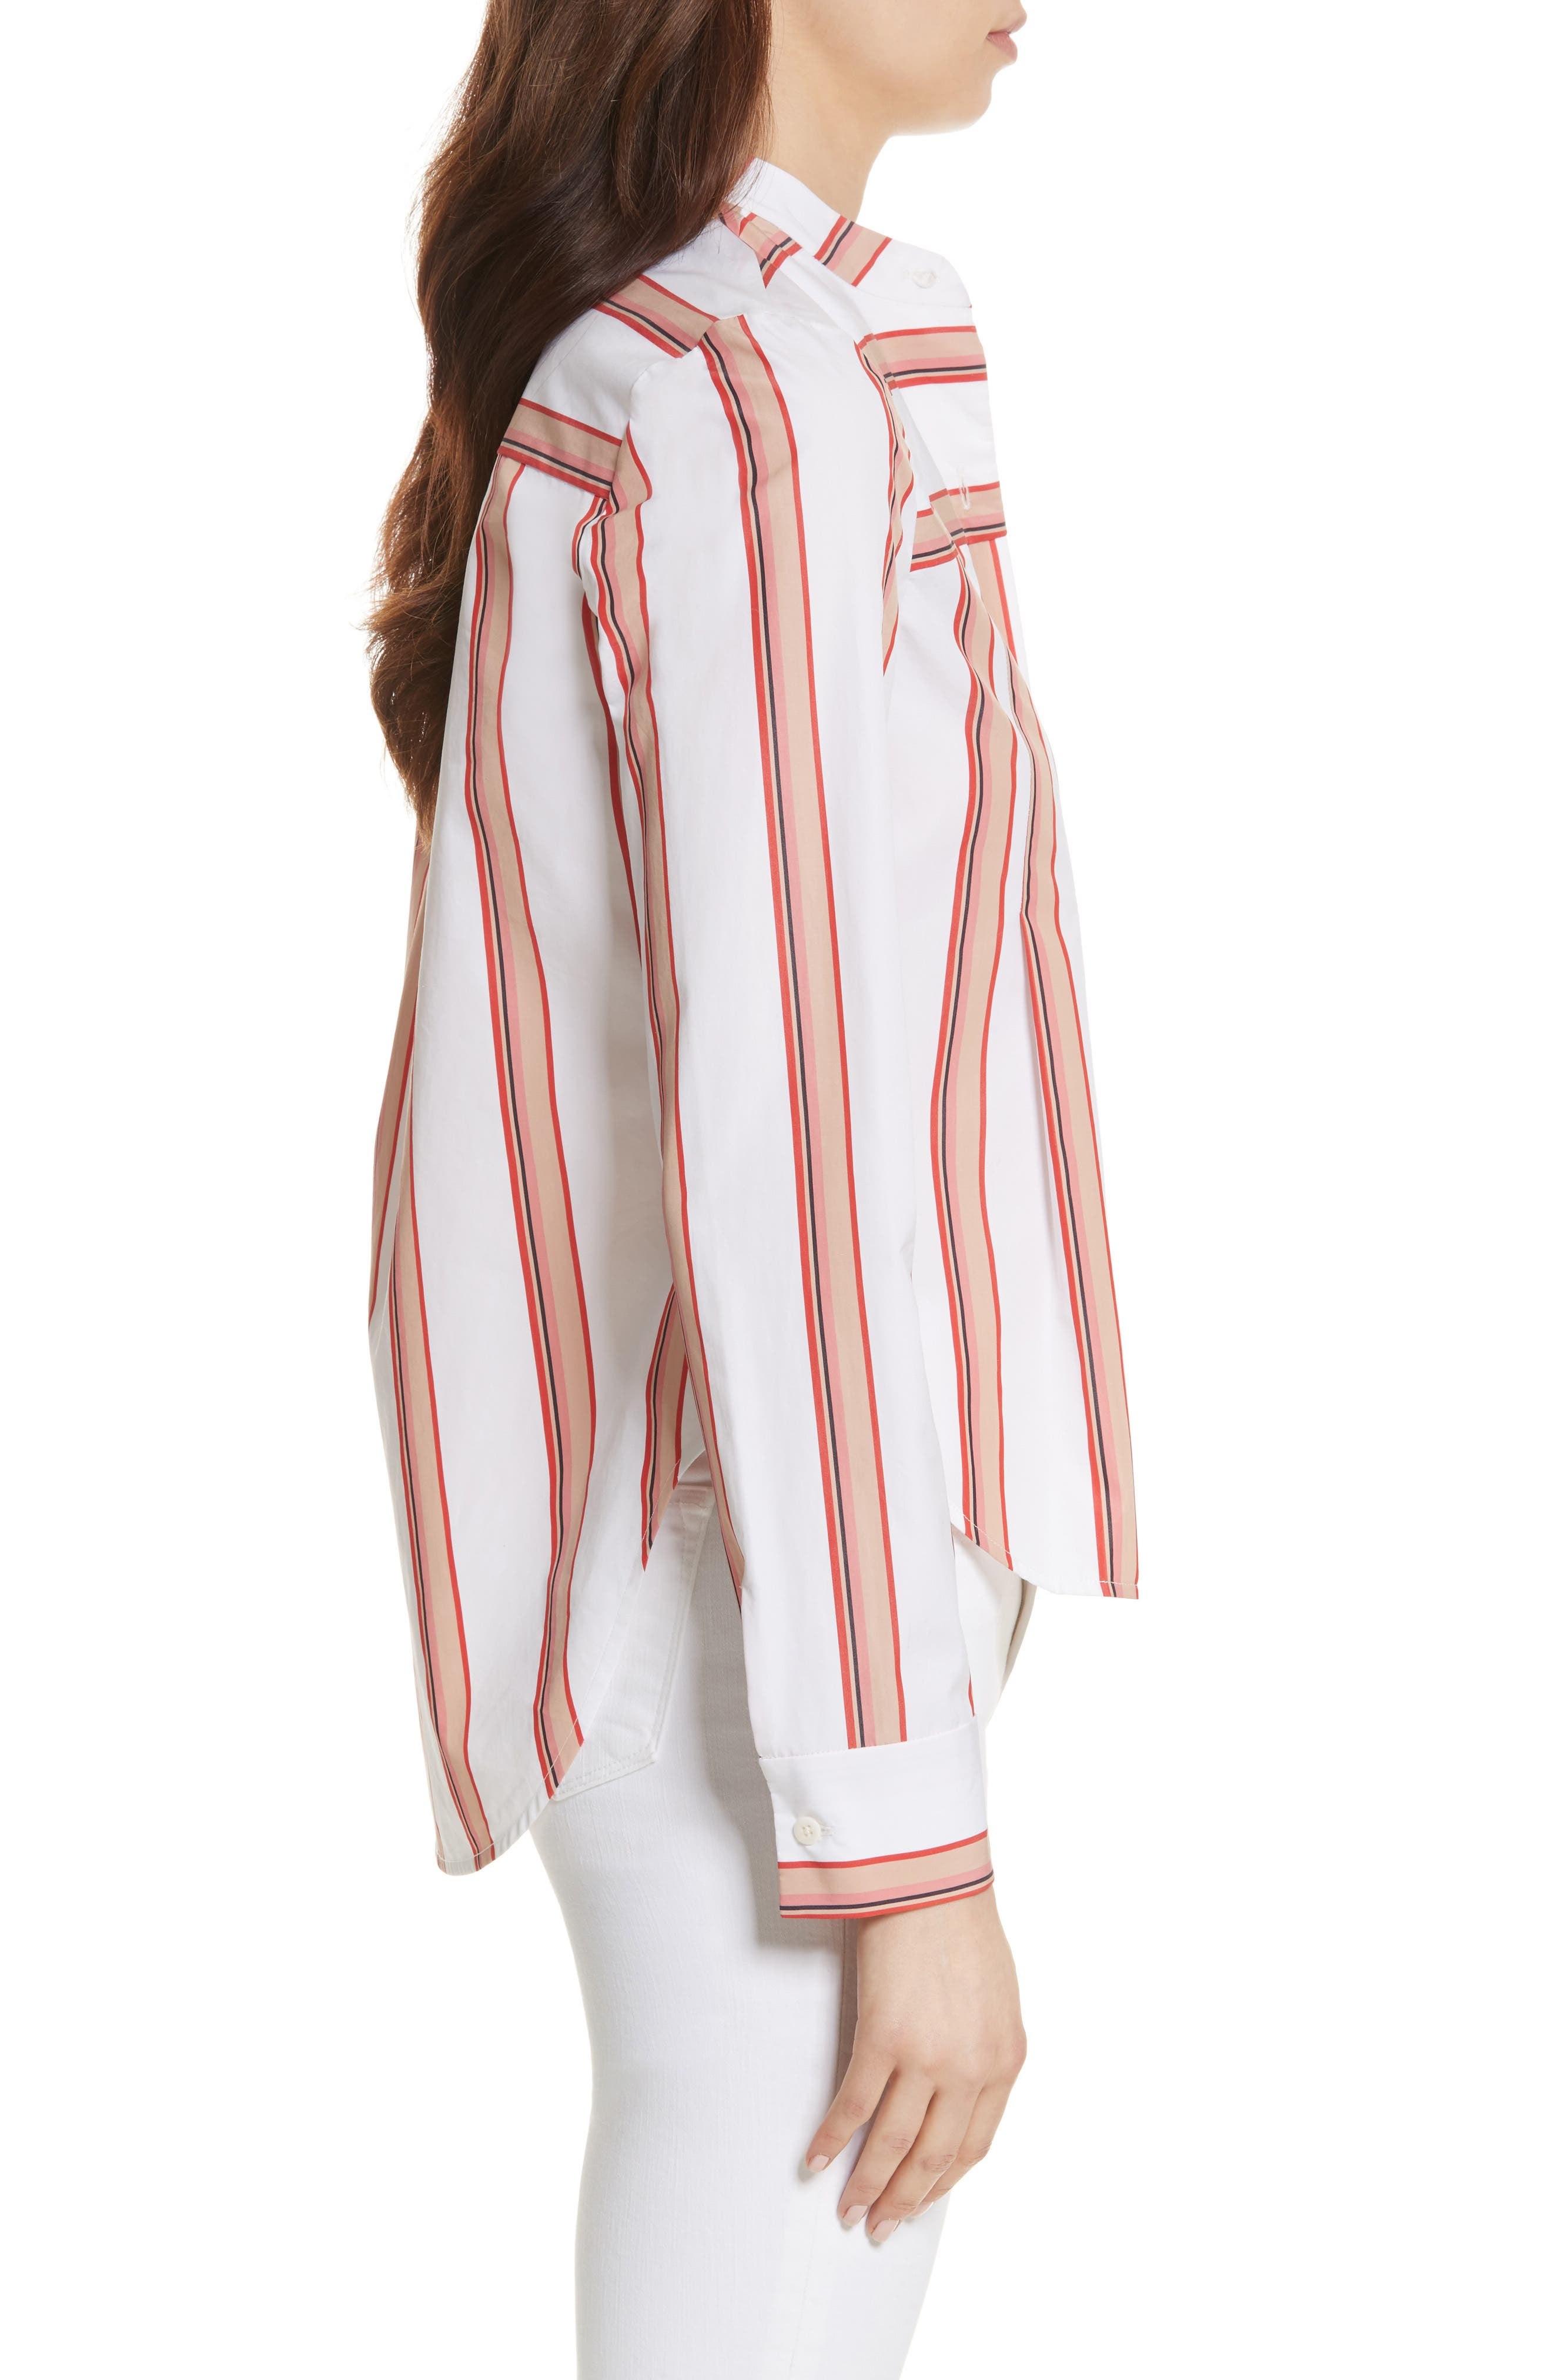 Diane von Furstenberg Stripe Shirt,                             Alternate thumbnail 3, color,                             107